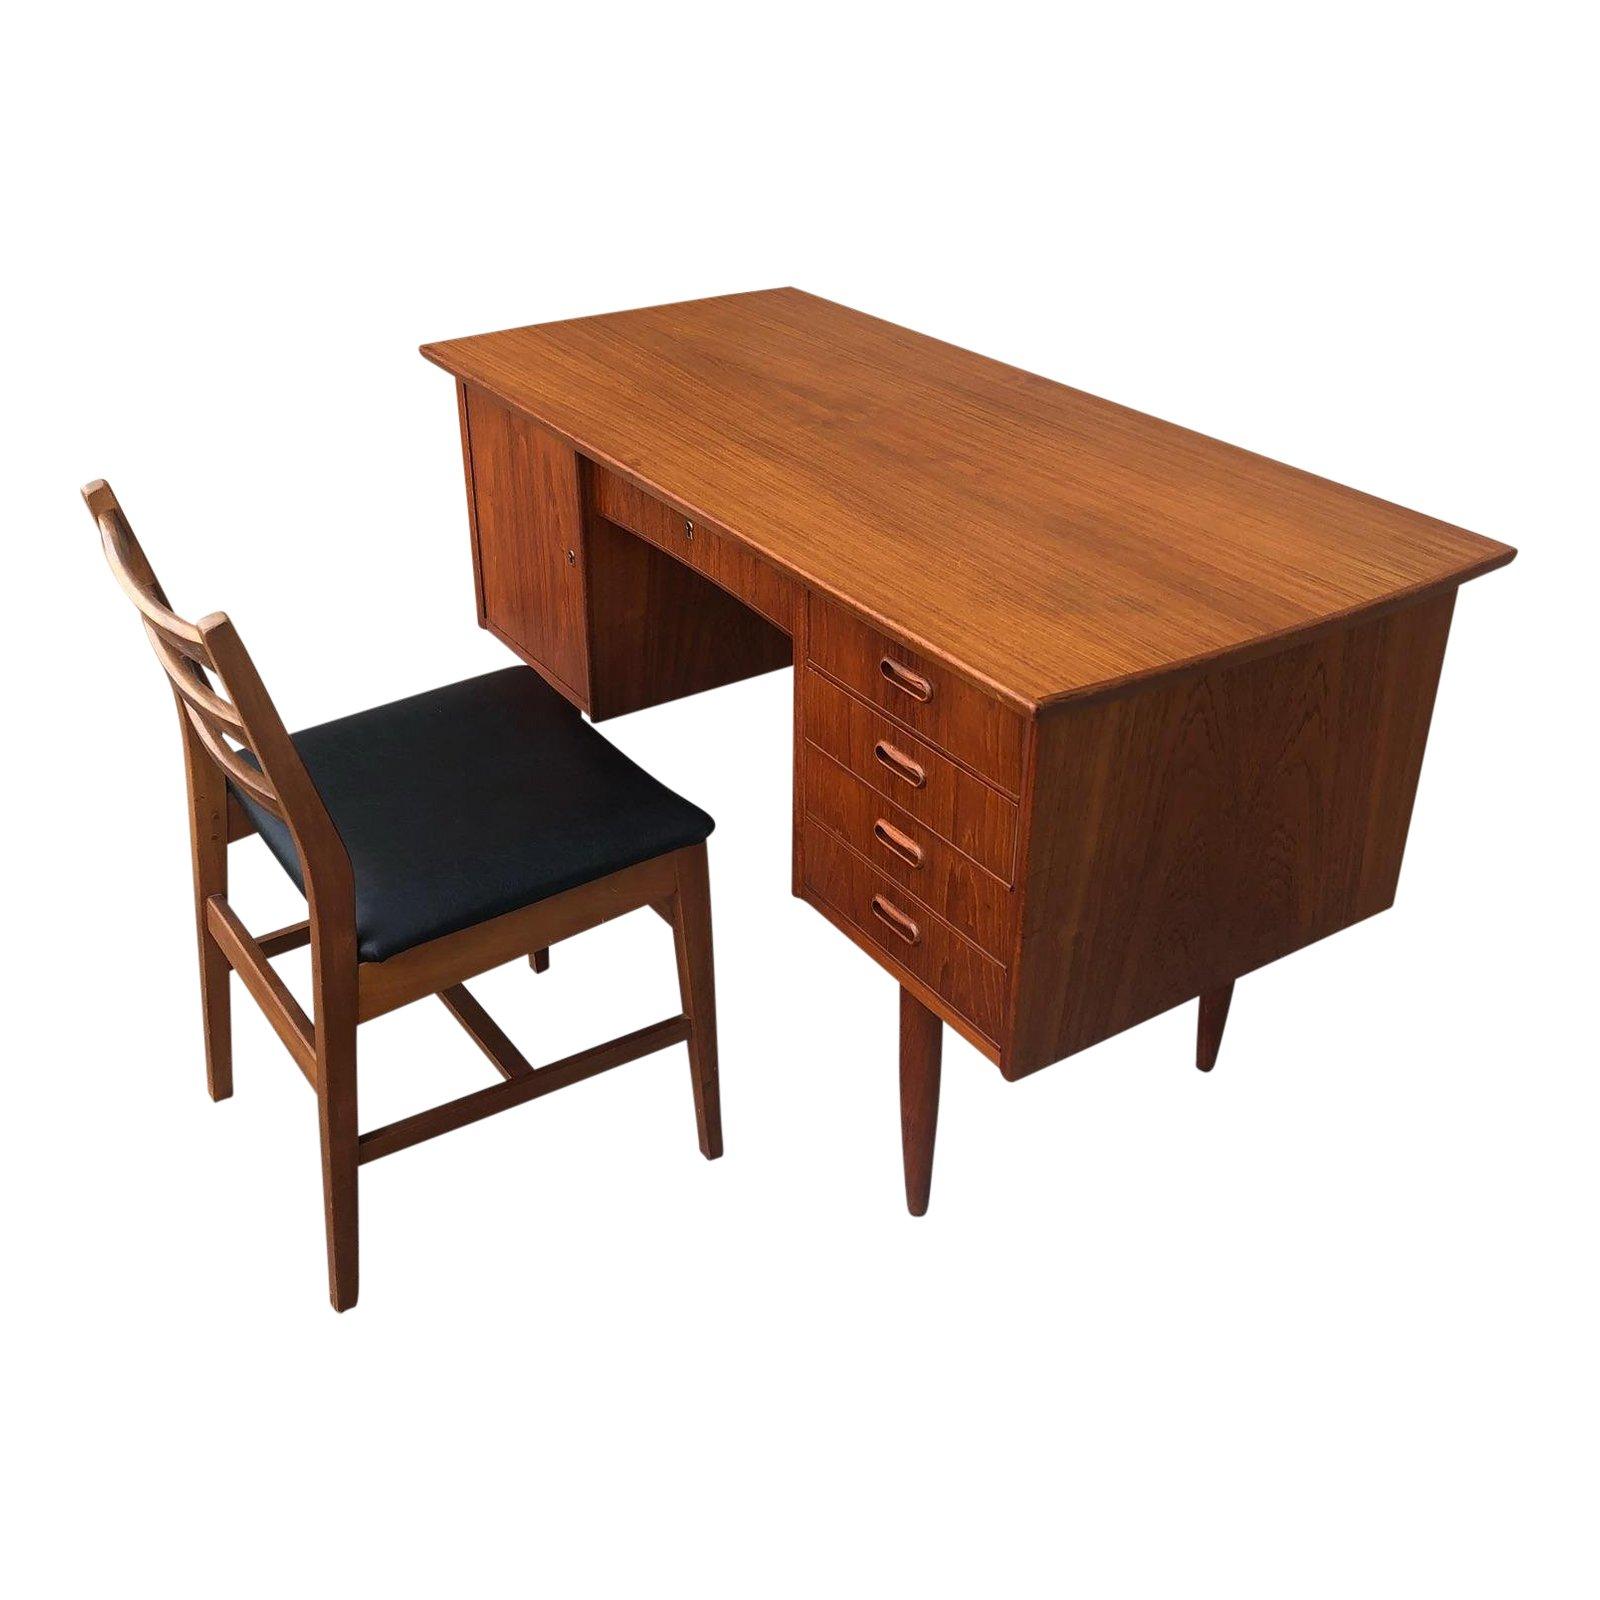 Image of: Danish Modern Teak Desk Chair Princessantiques Net